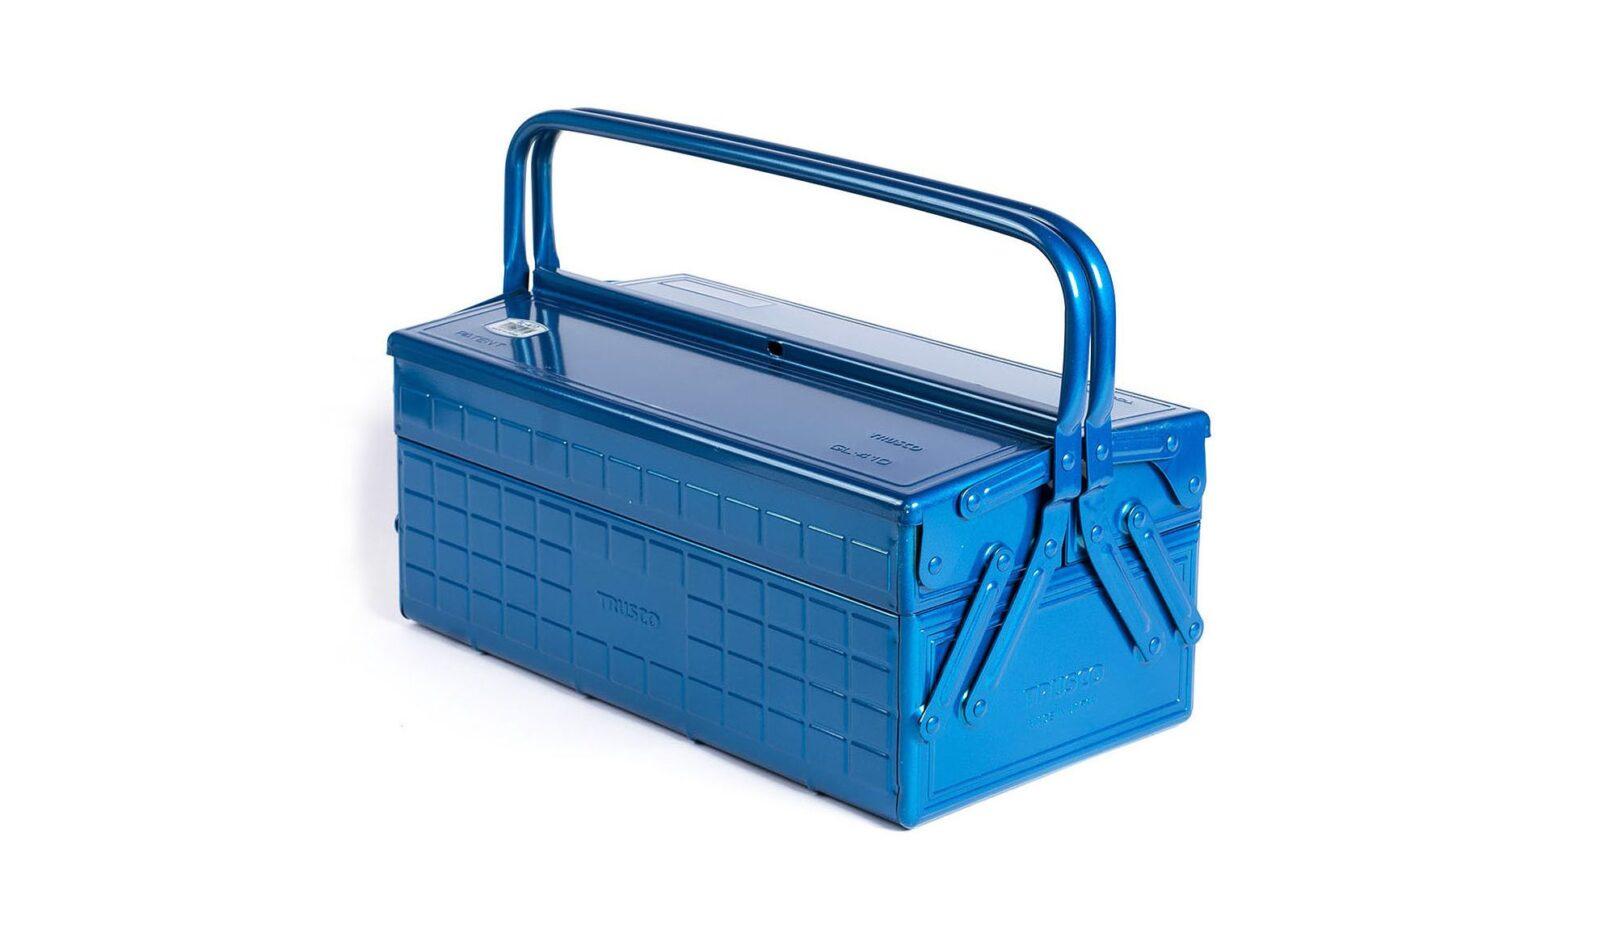 Trusco Toolbox e1489638767780 1600x929 - Original Trusco Cantilever Toolbox